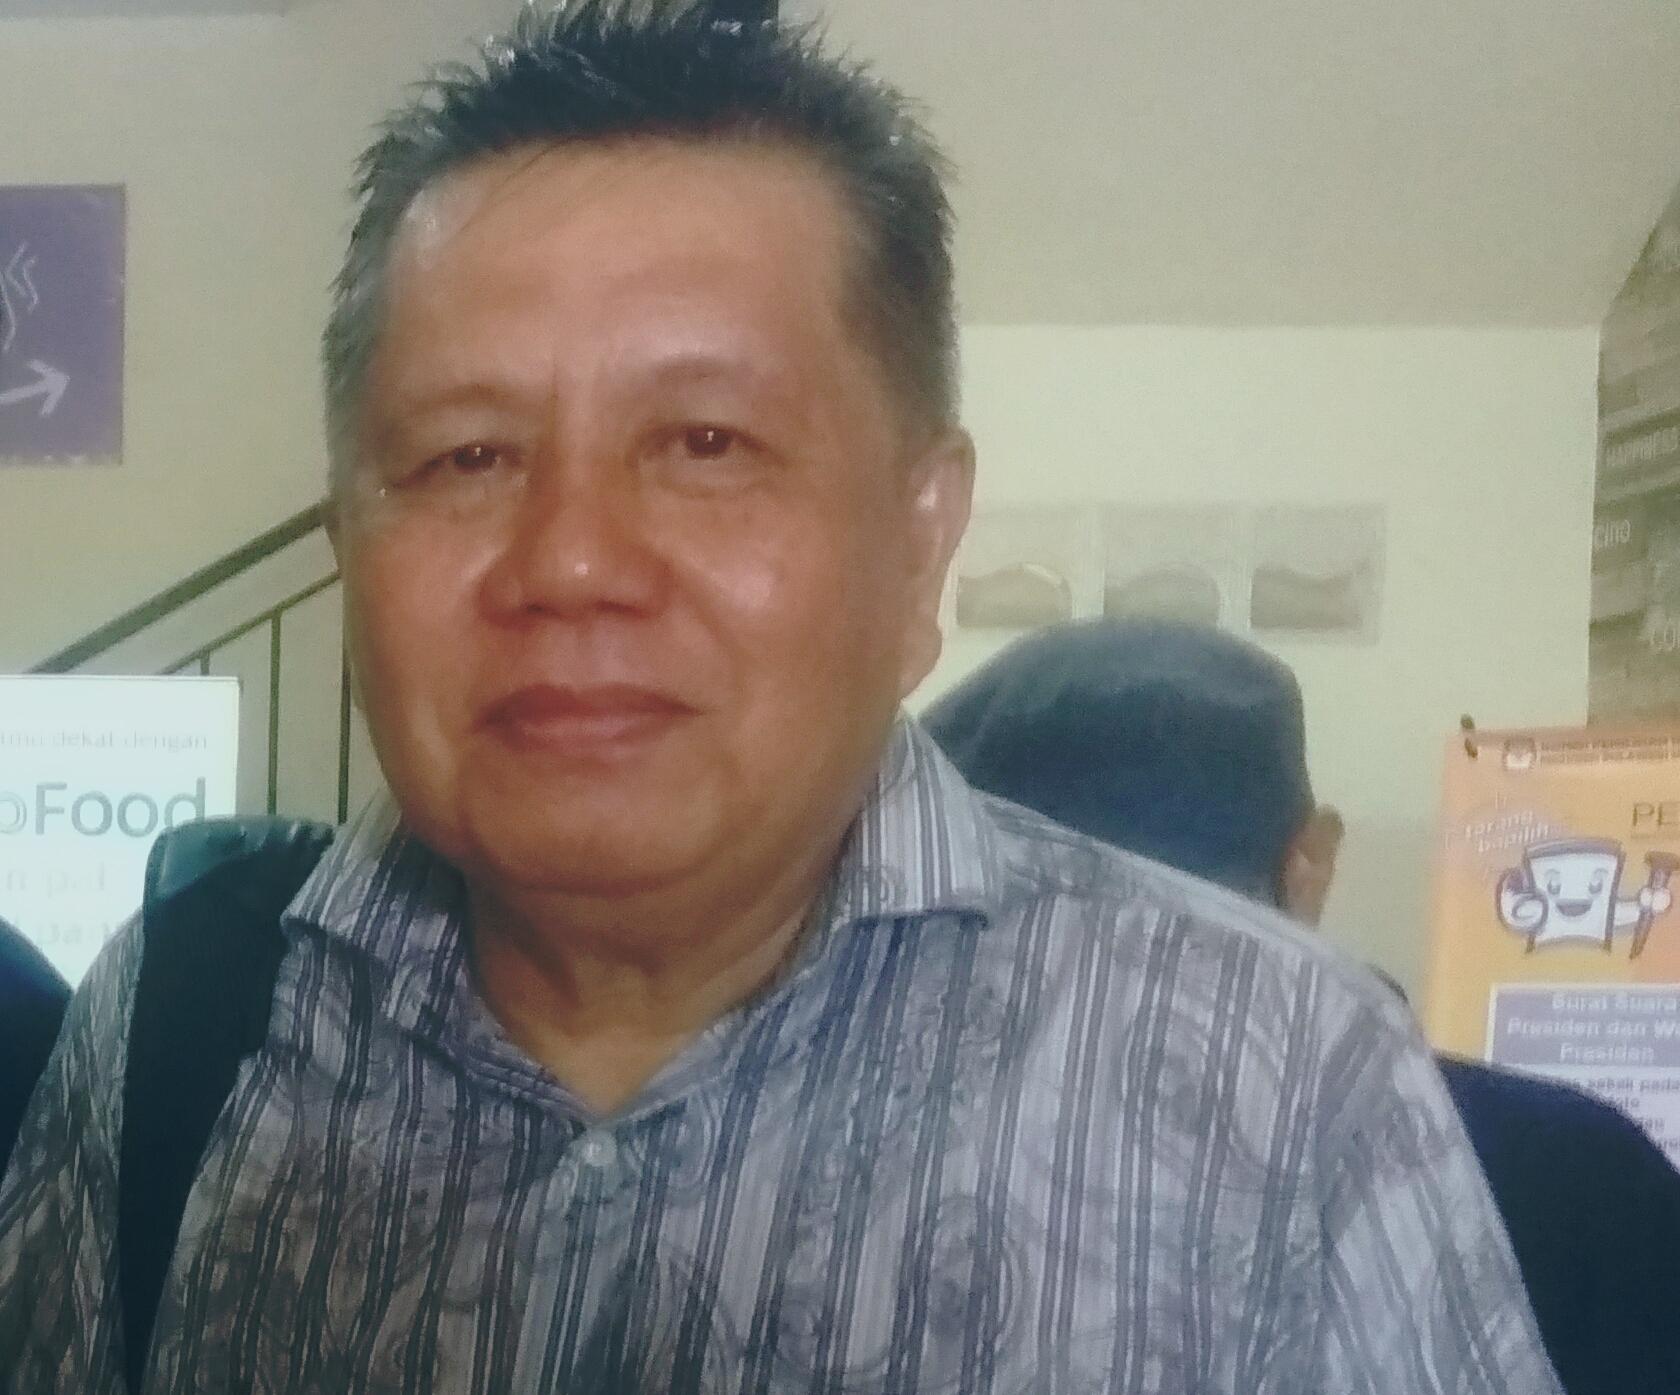 H-2 Jelang Pemilu 17 April 2019, Artur Kotambunan Ajak Jaga Keamanan dan Jangan Golput